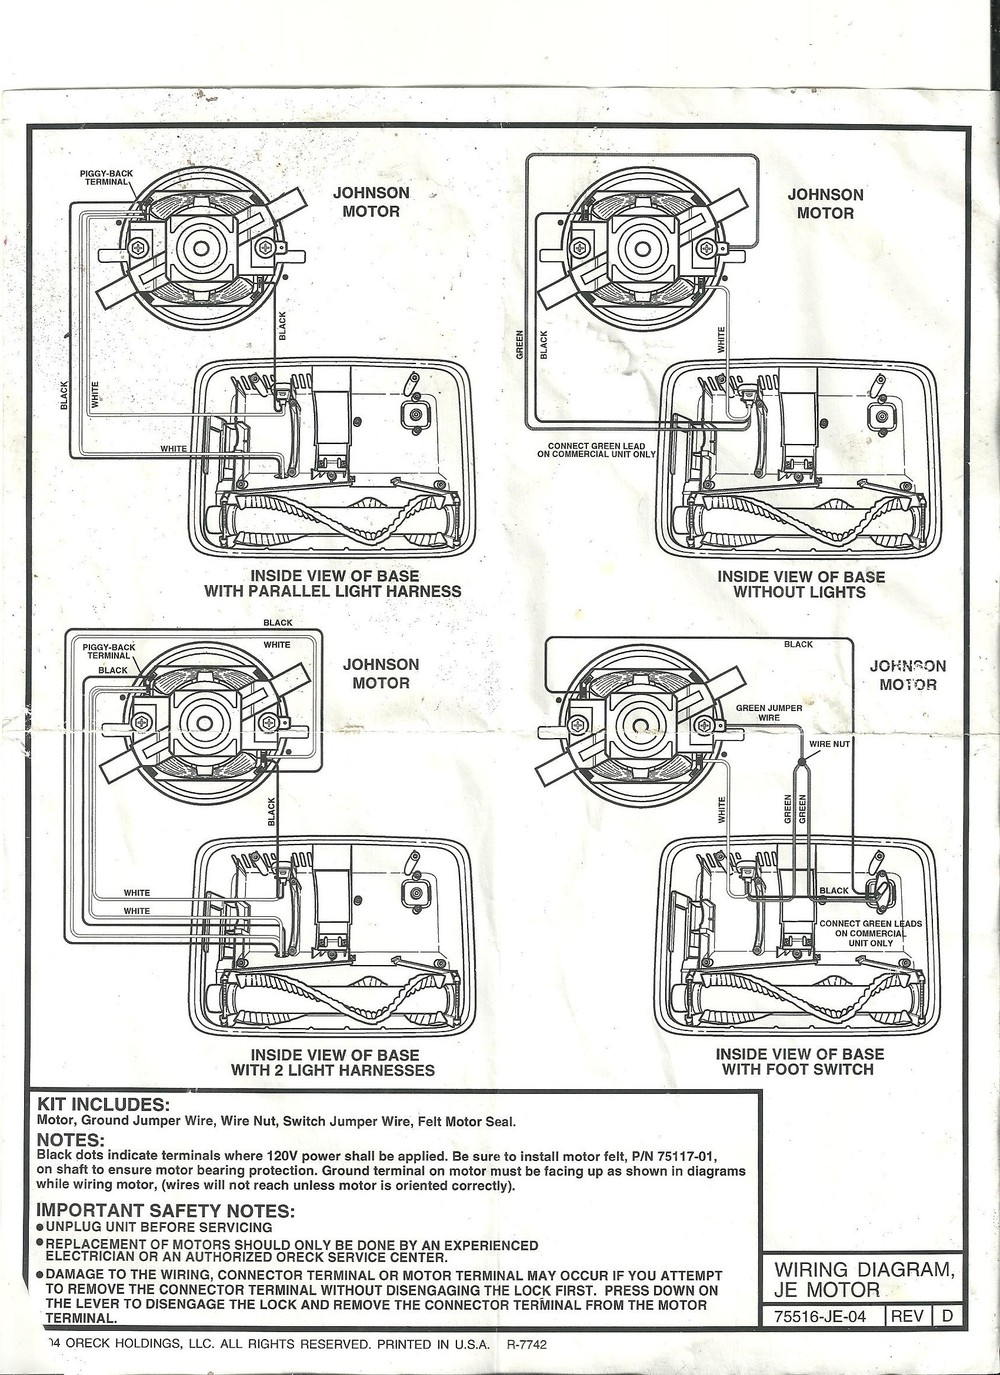 Pleasant Oreck Motor Wiring Diagram Wiring Diagram Database Wiring 101 Jonihateforg